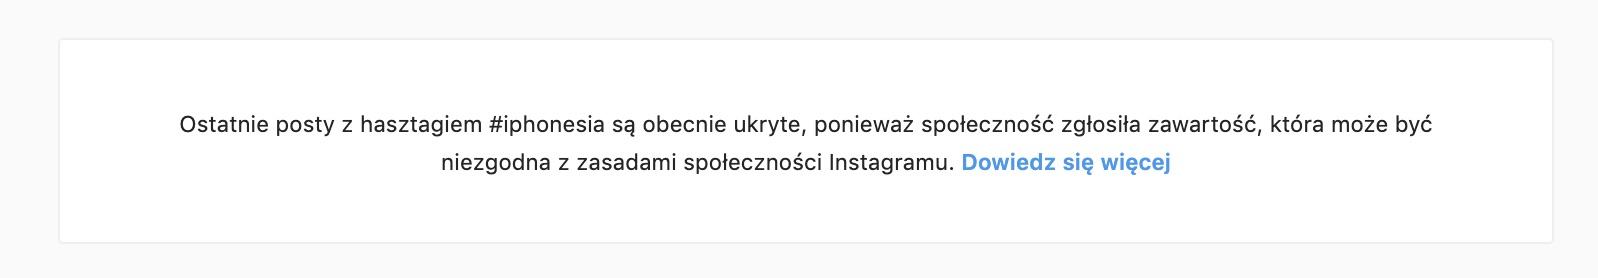 hasztagi instagram zbanowane hashtagi iphonesia